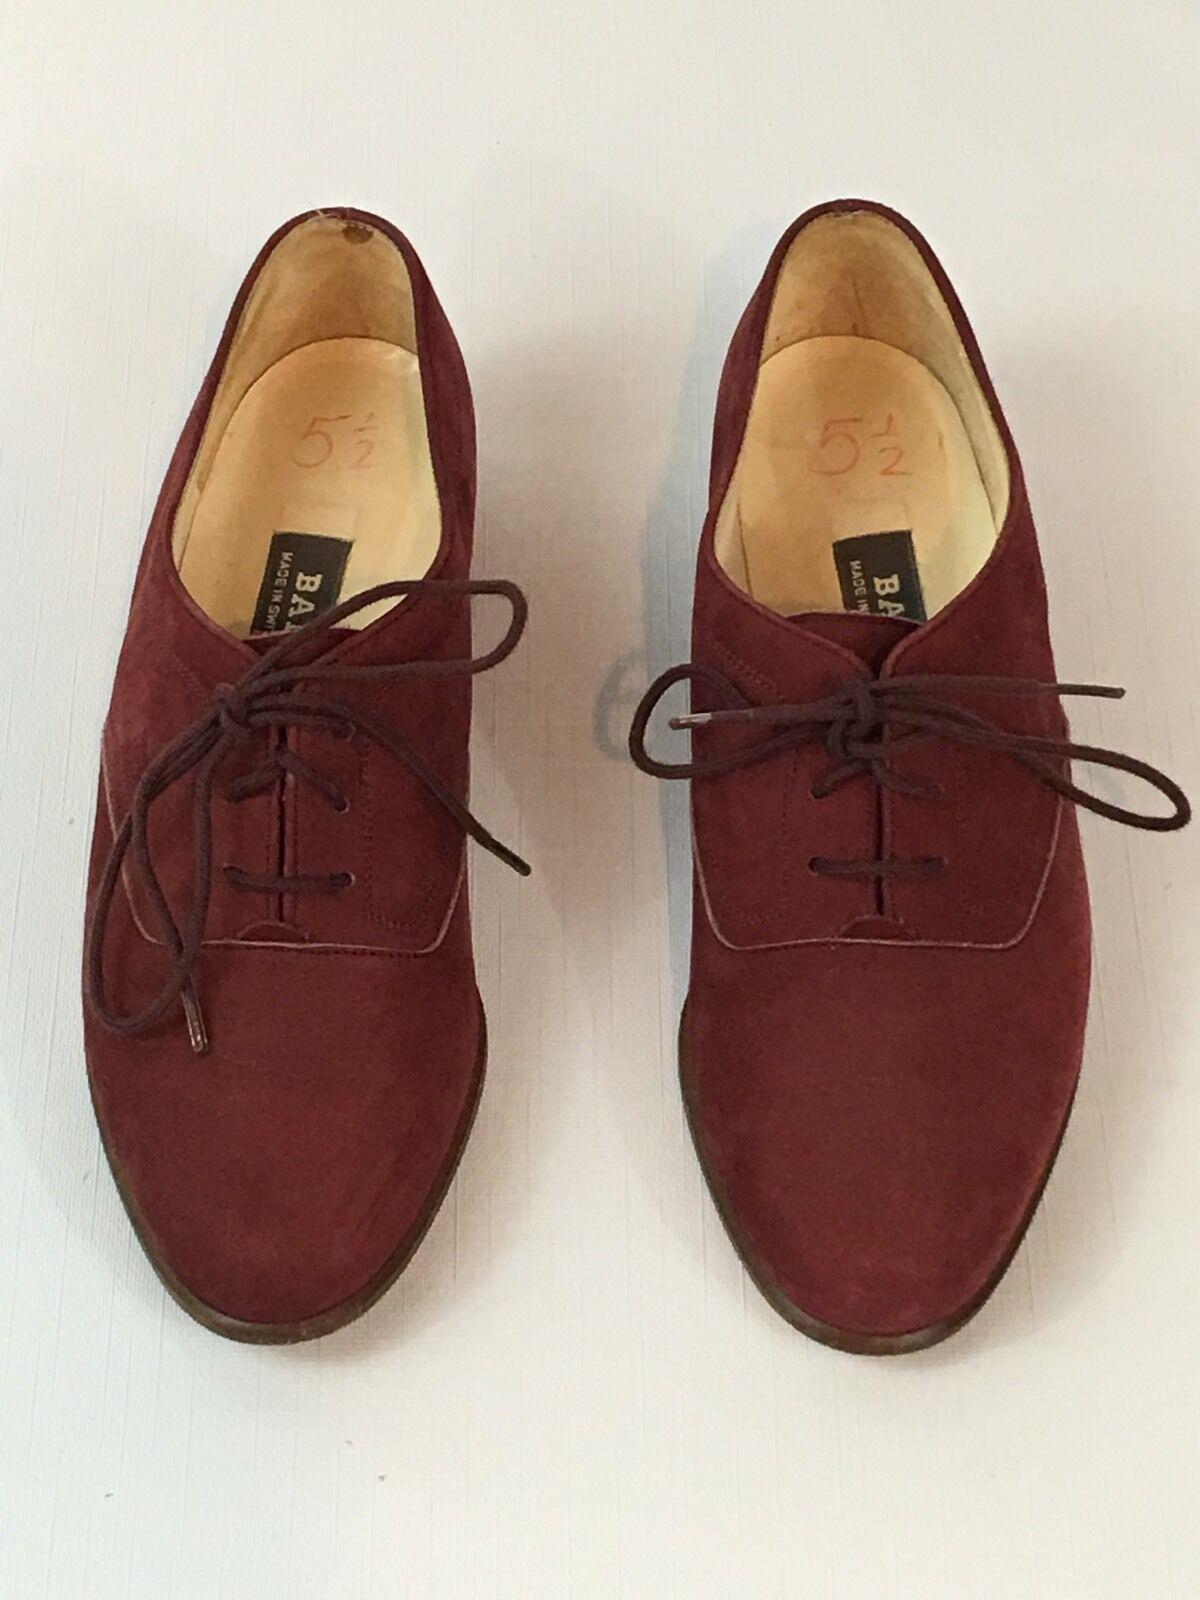 Donna Bally Wine Rossodish Leather/Suede Oxfords Size 3E -US 5 1/2 - Switzerland